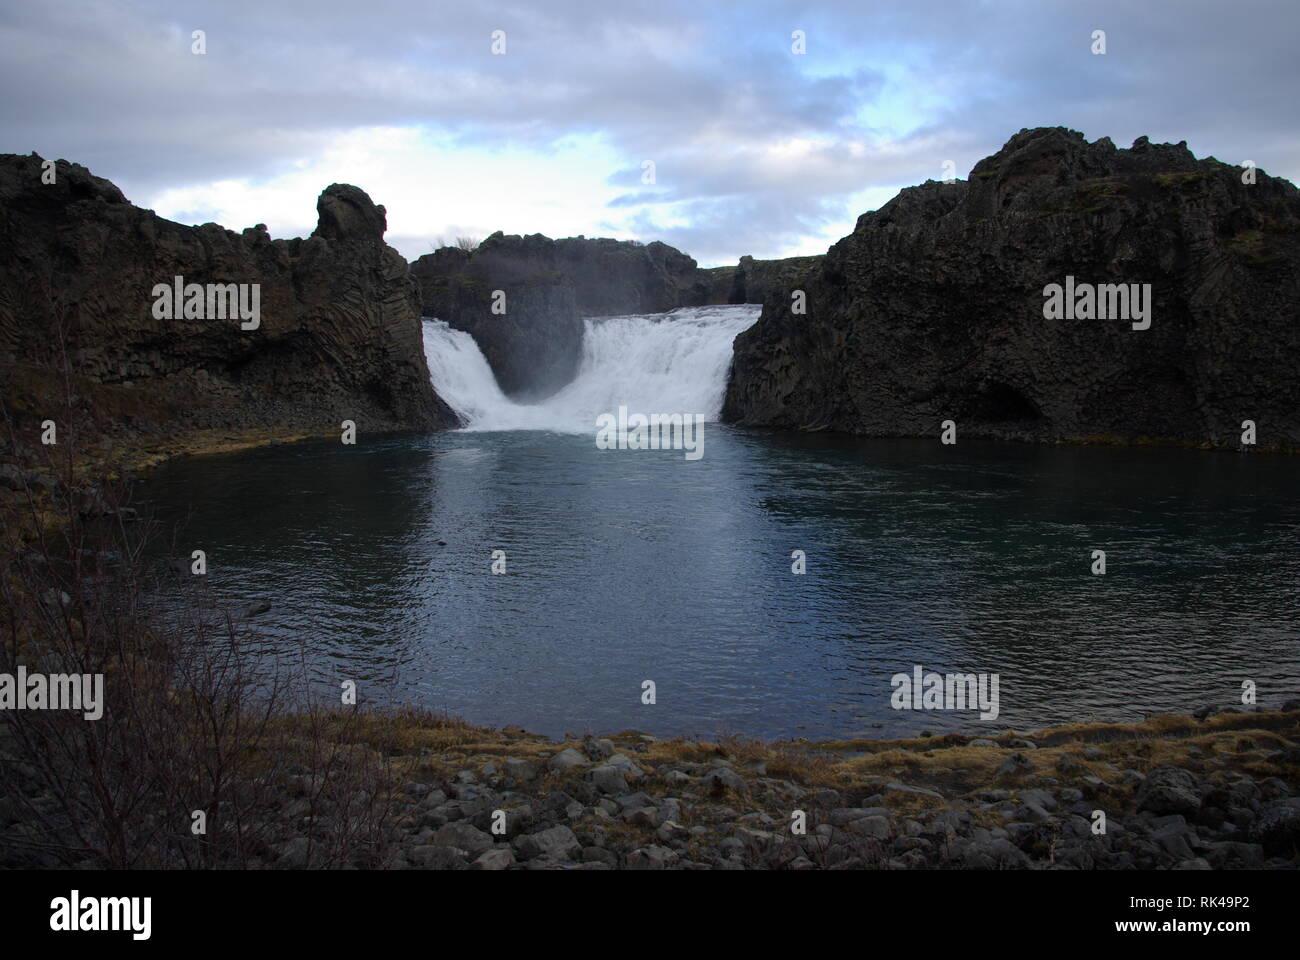 Doppelter Wasserfall Hjalparfoss auf Island Foto Stock